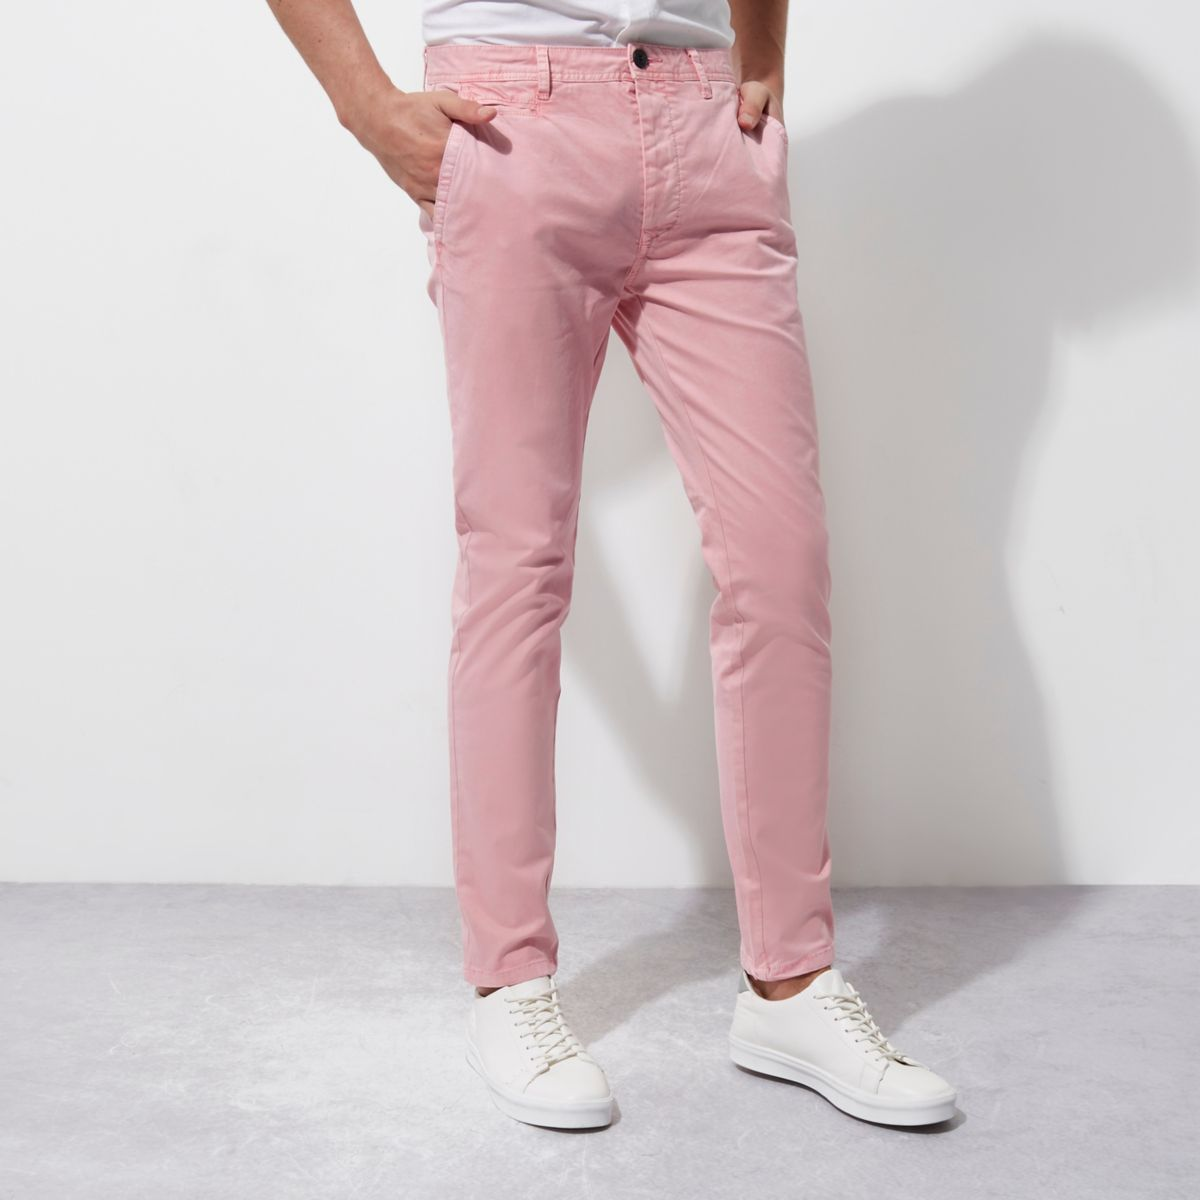 Pantalon chino rose coupe skinny